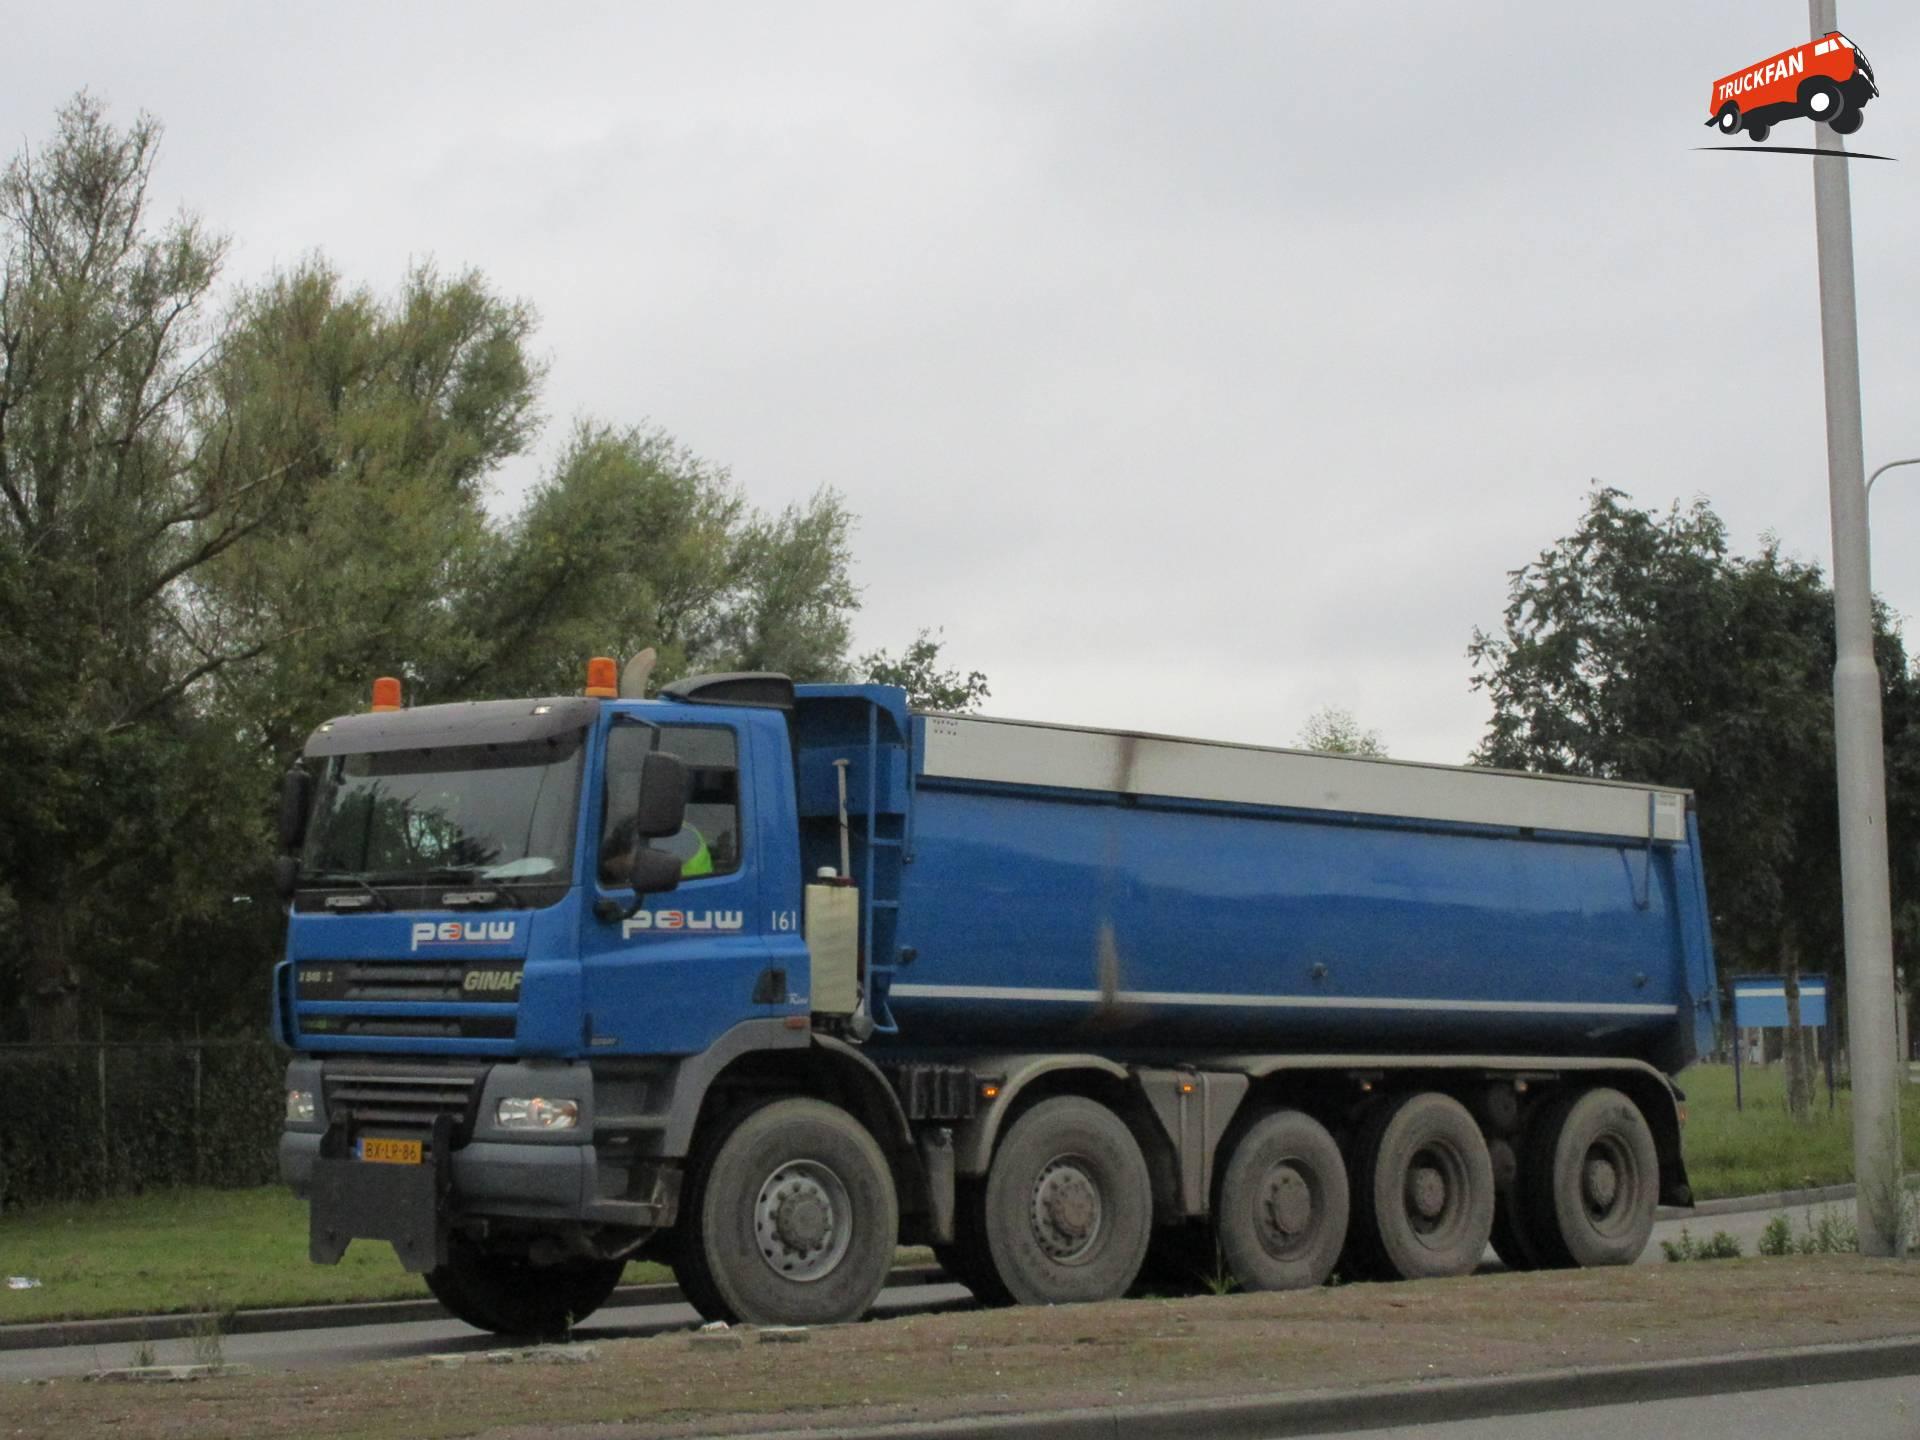 GINAF X5450-S